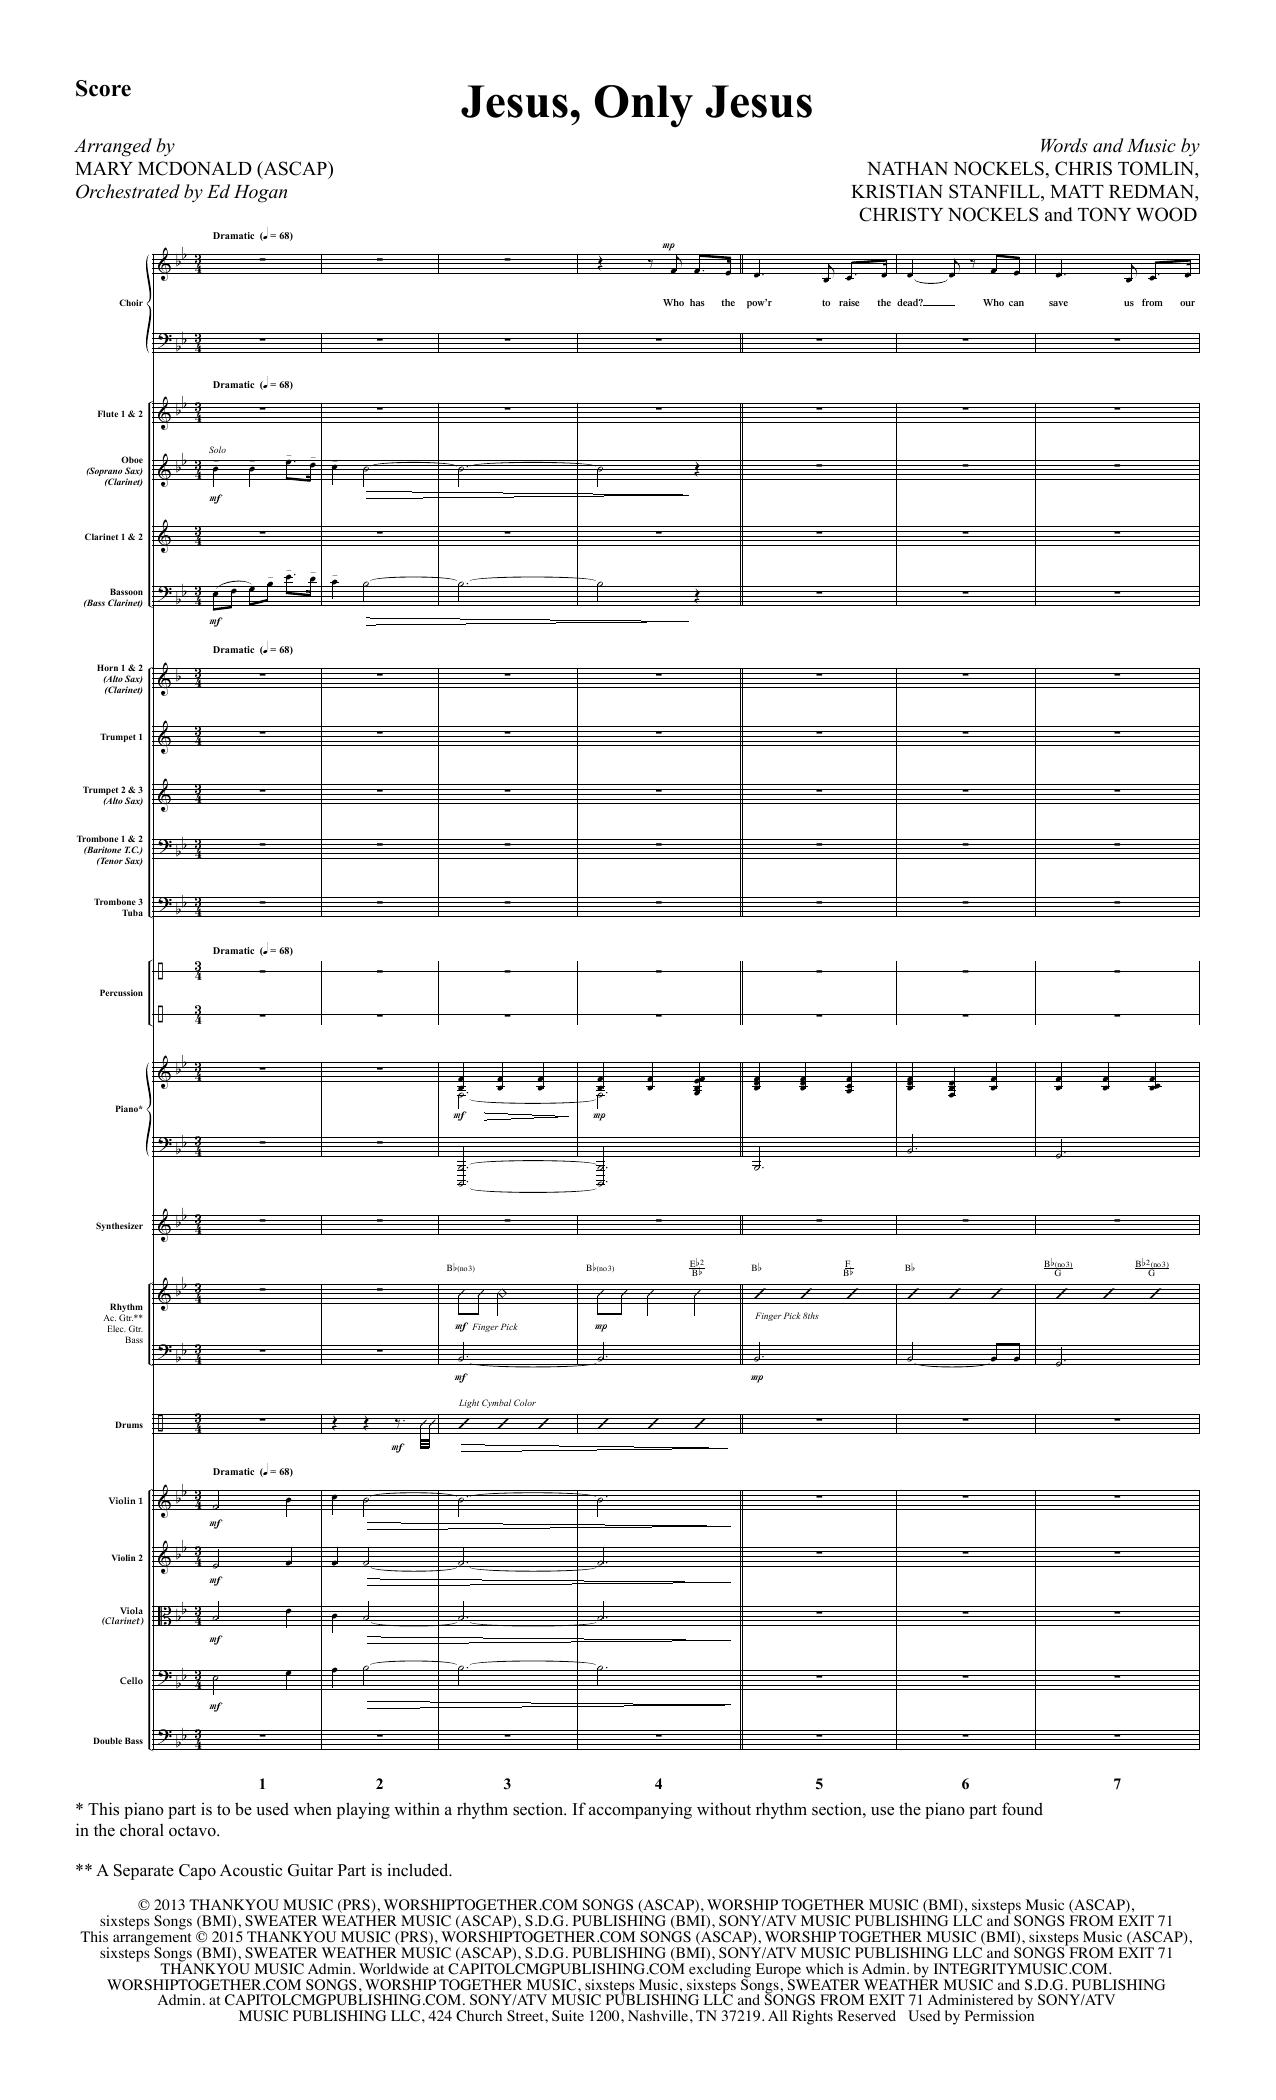 Jesus, Only Jesus - Full Score sheet music